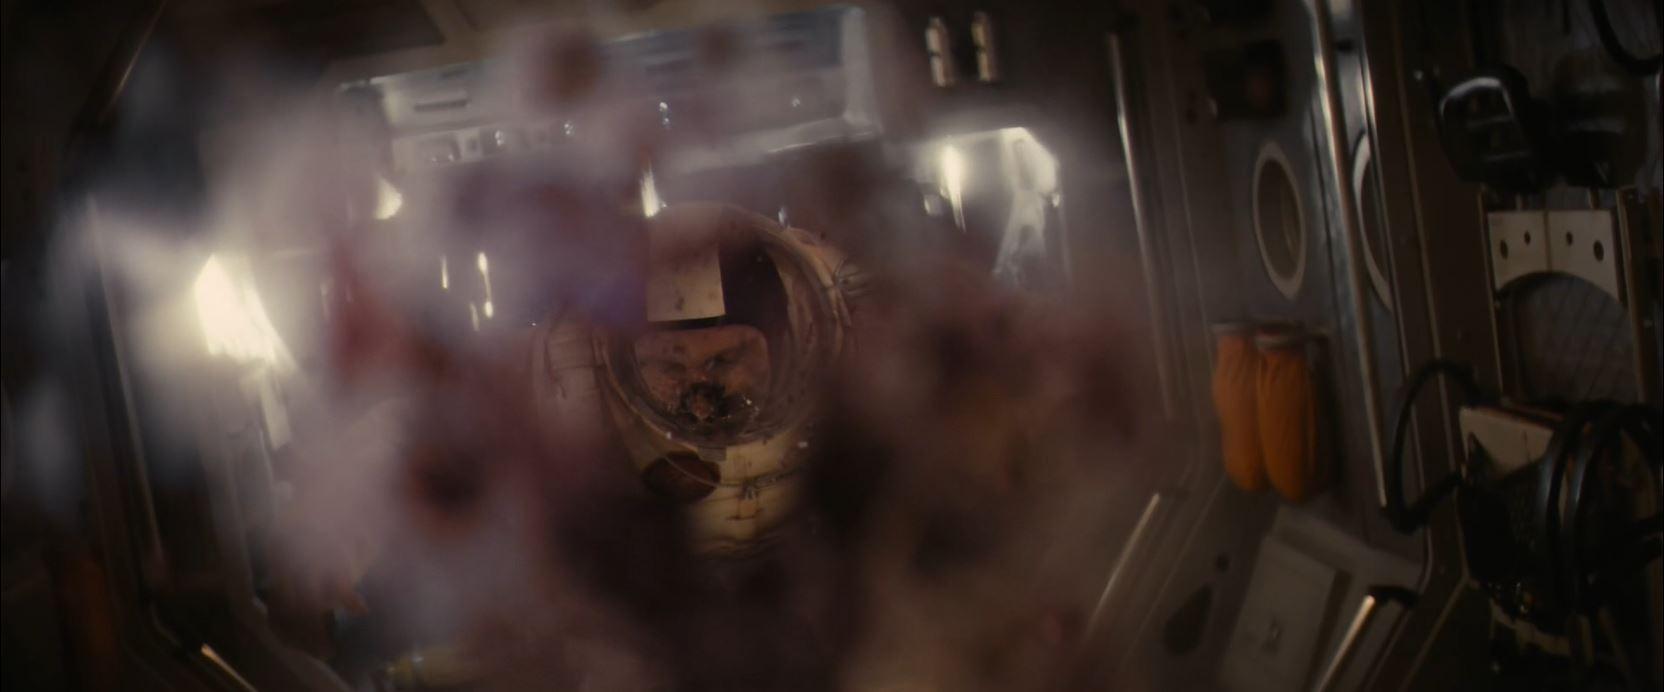 Erwin the Zombie - Last Days on Mars